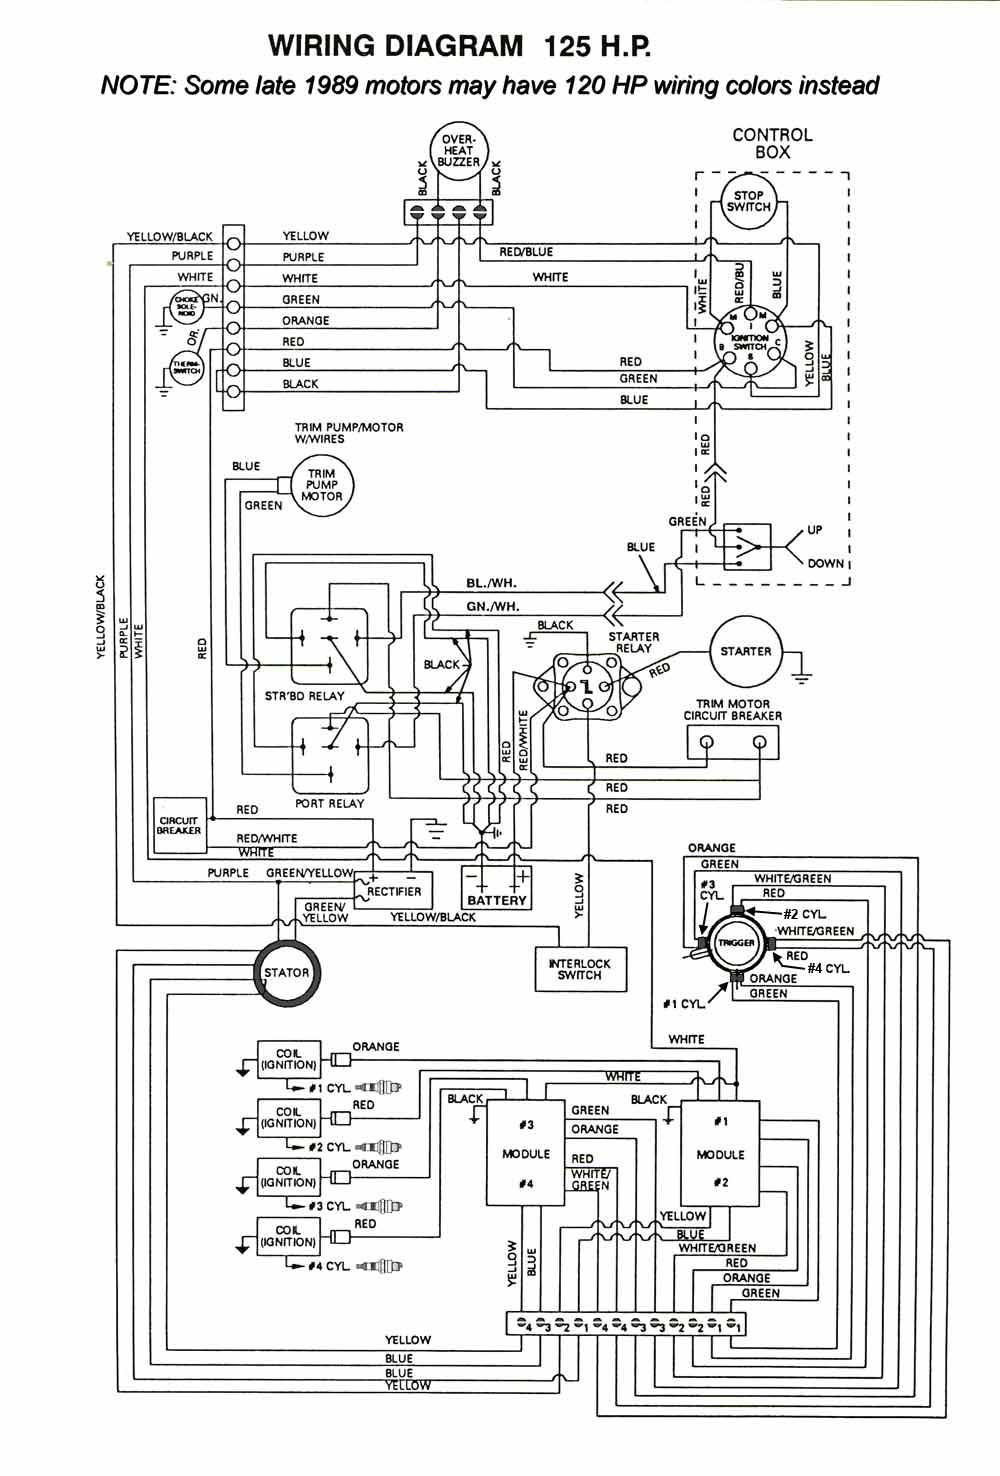 mastertech marine chrysler force outboard wiring diagrams wiring rh 49 kurort zu hause de mercruiser 4.3 wiring -diagram 125 hp wiring diagram auto today force outboard motor parts diagram chrysler wiring diagrams mastertech mercury